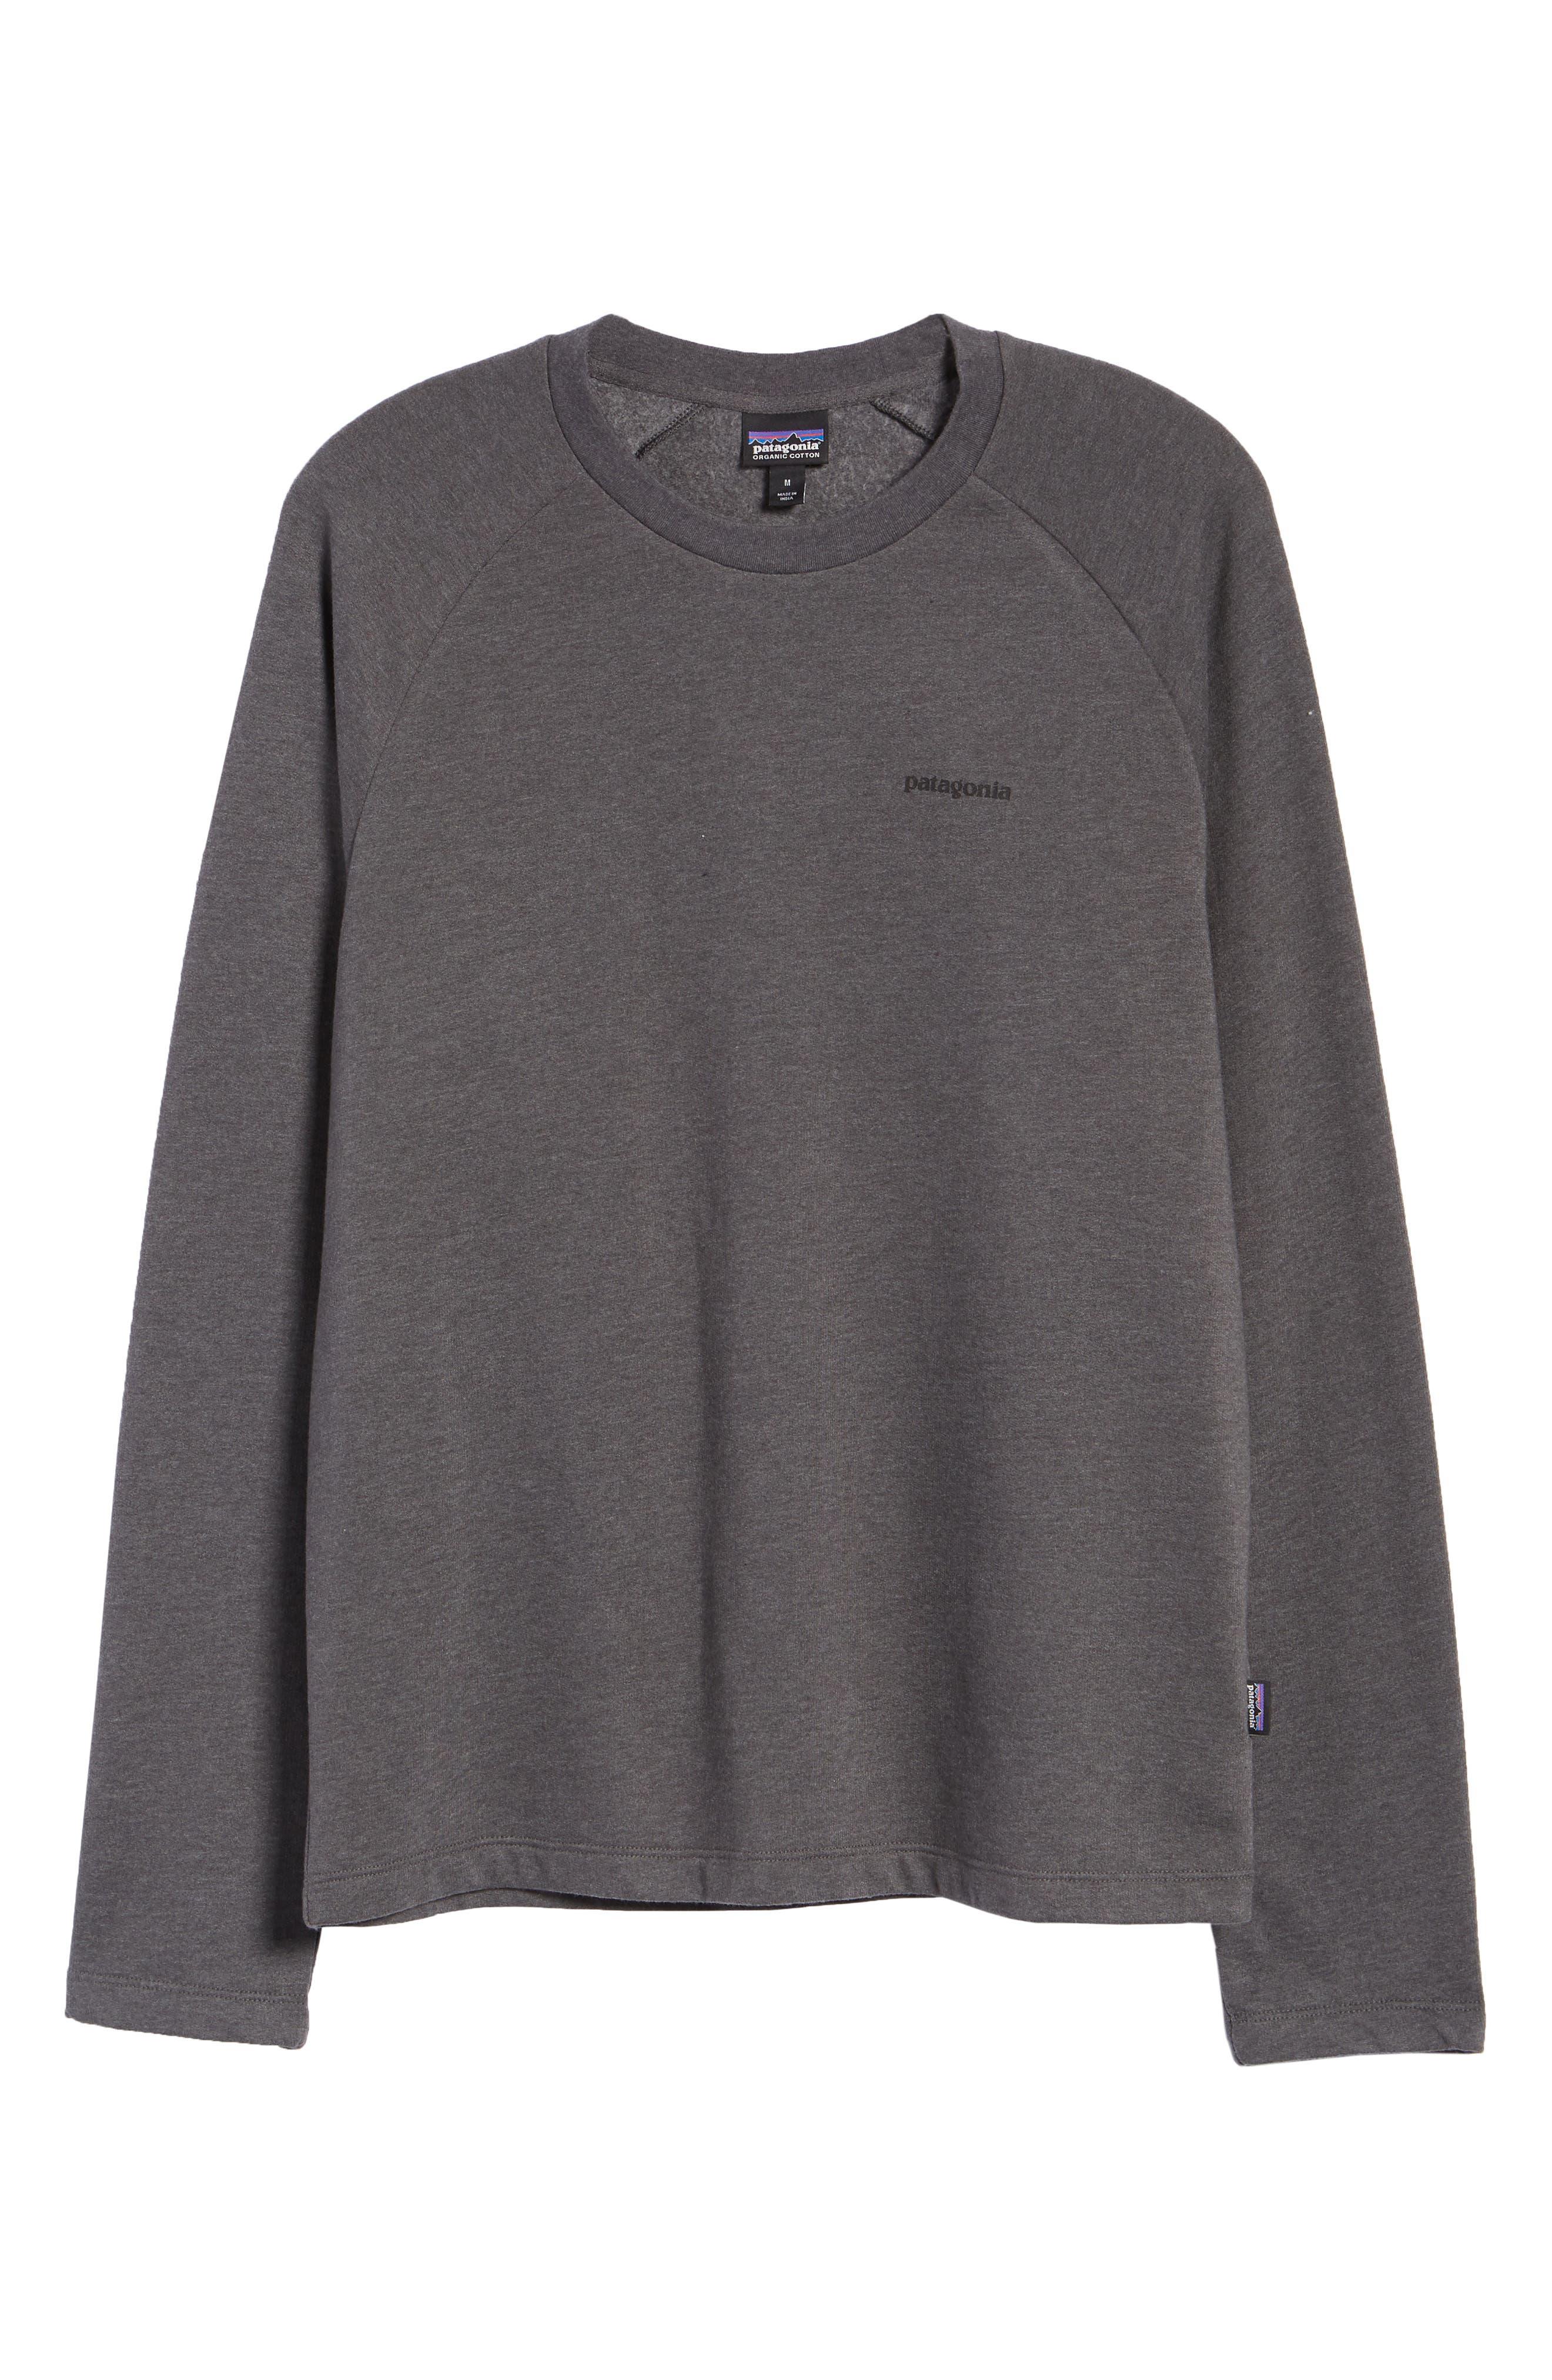 PATAGONIA,                             P-6 Logo Slim Fit Lightweight Sweatshirt,                             Alternate thumbnail 6, color,                             FORGE GREY